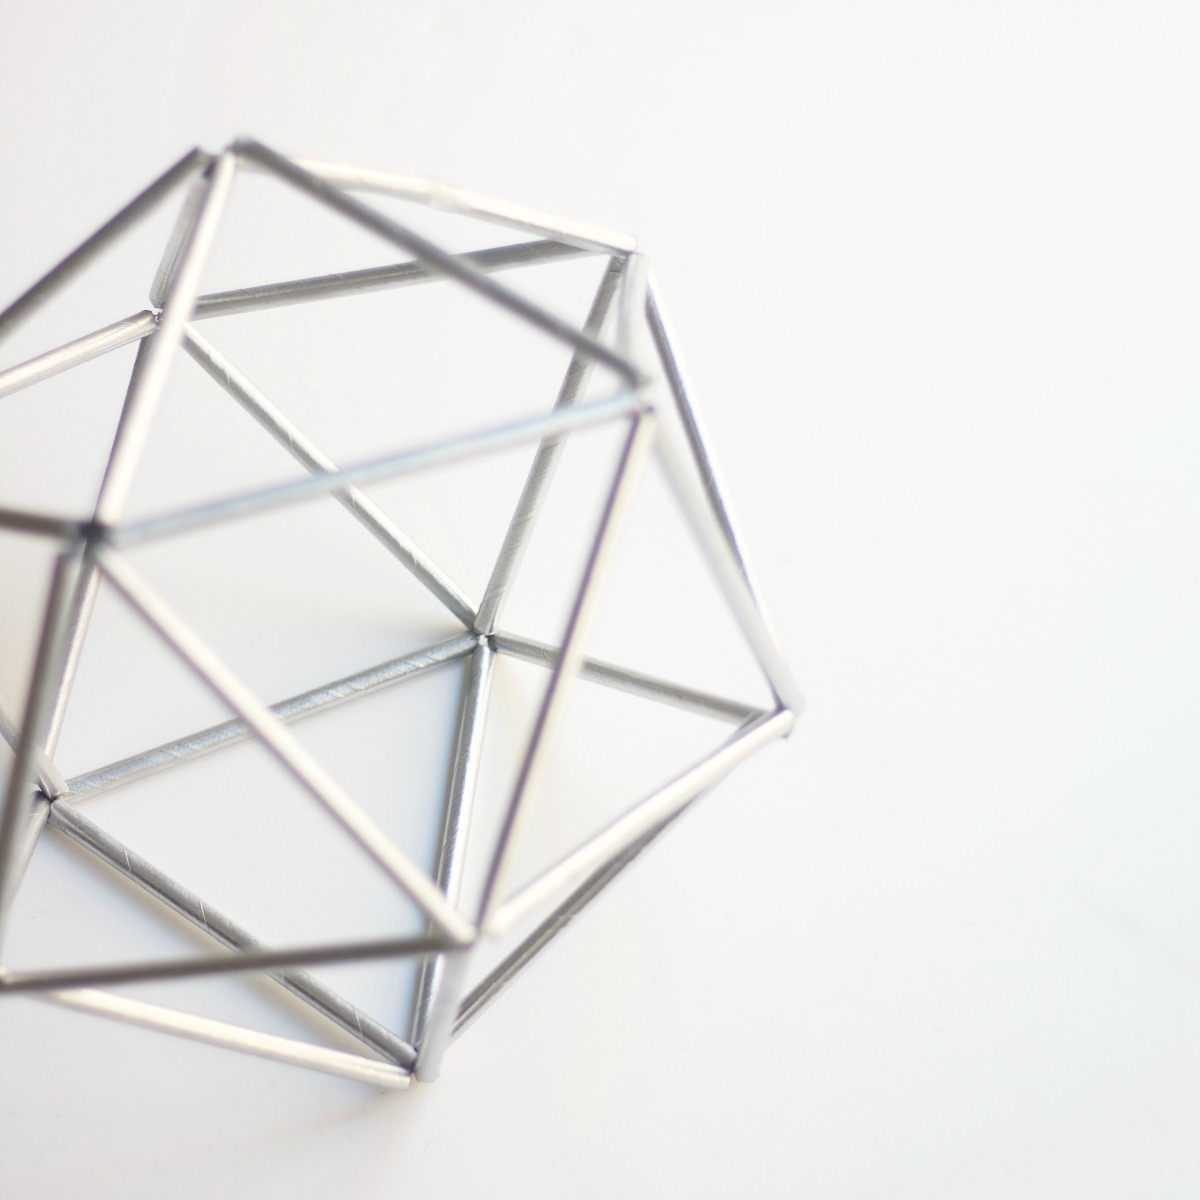 Geometric Home Decor: DIY Geometric Decor For $1